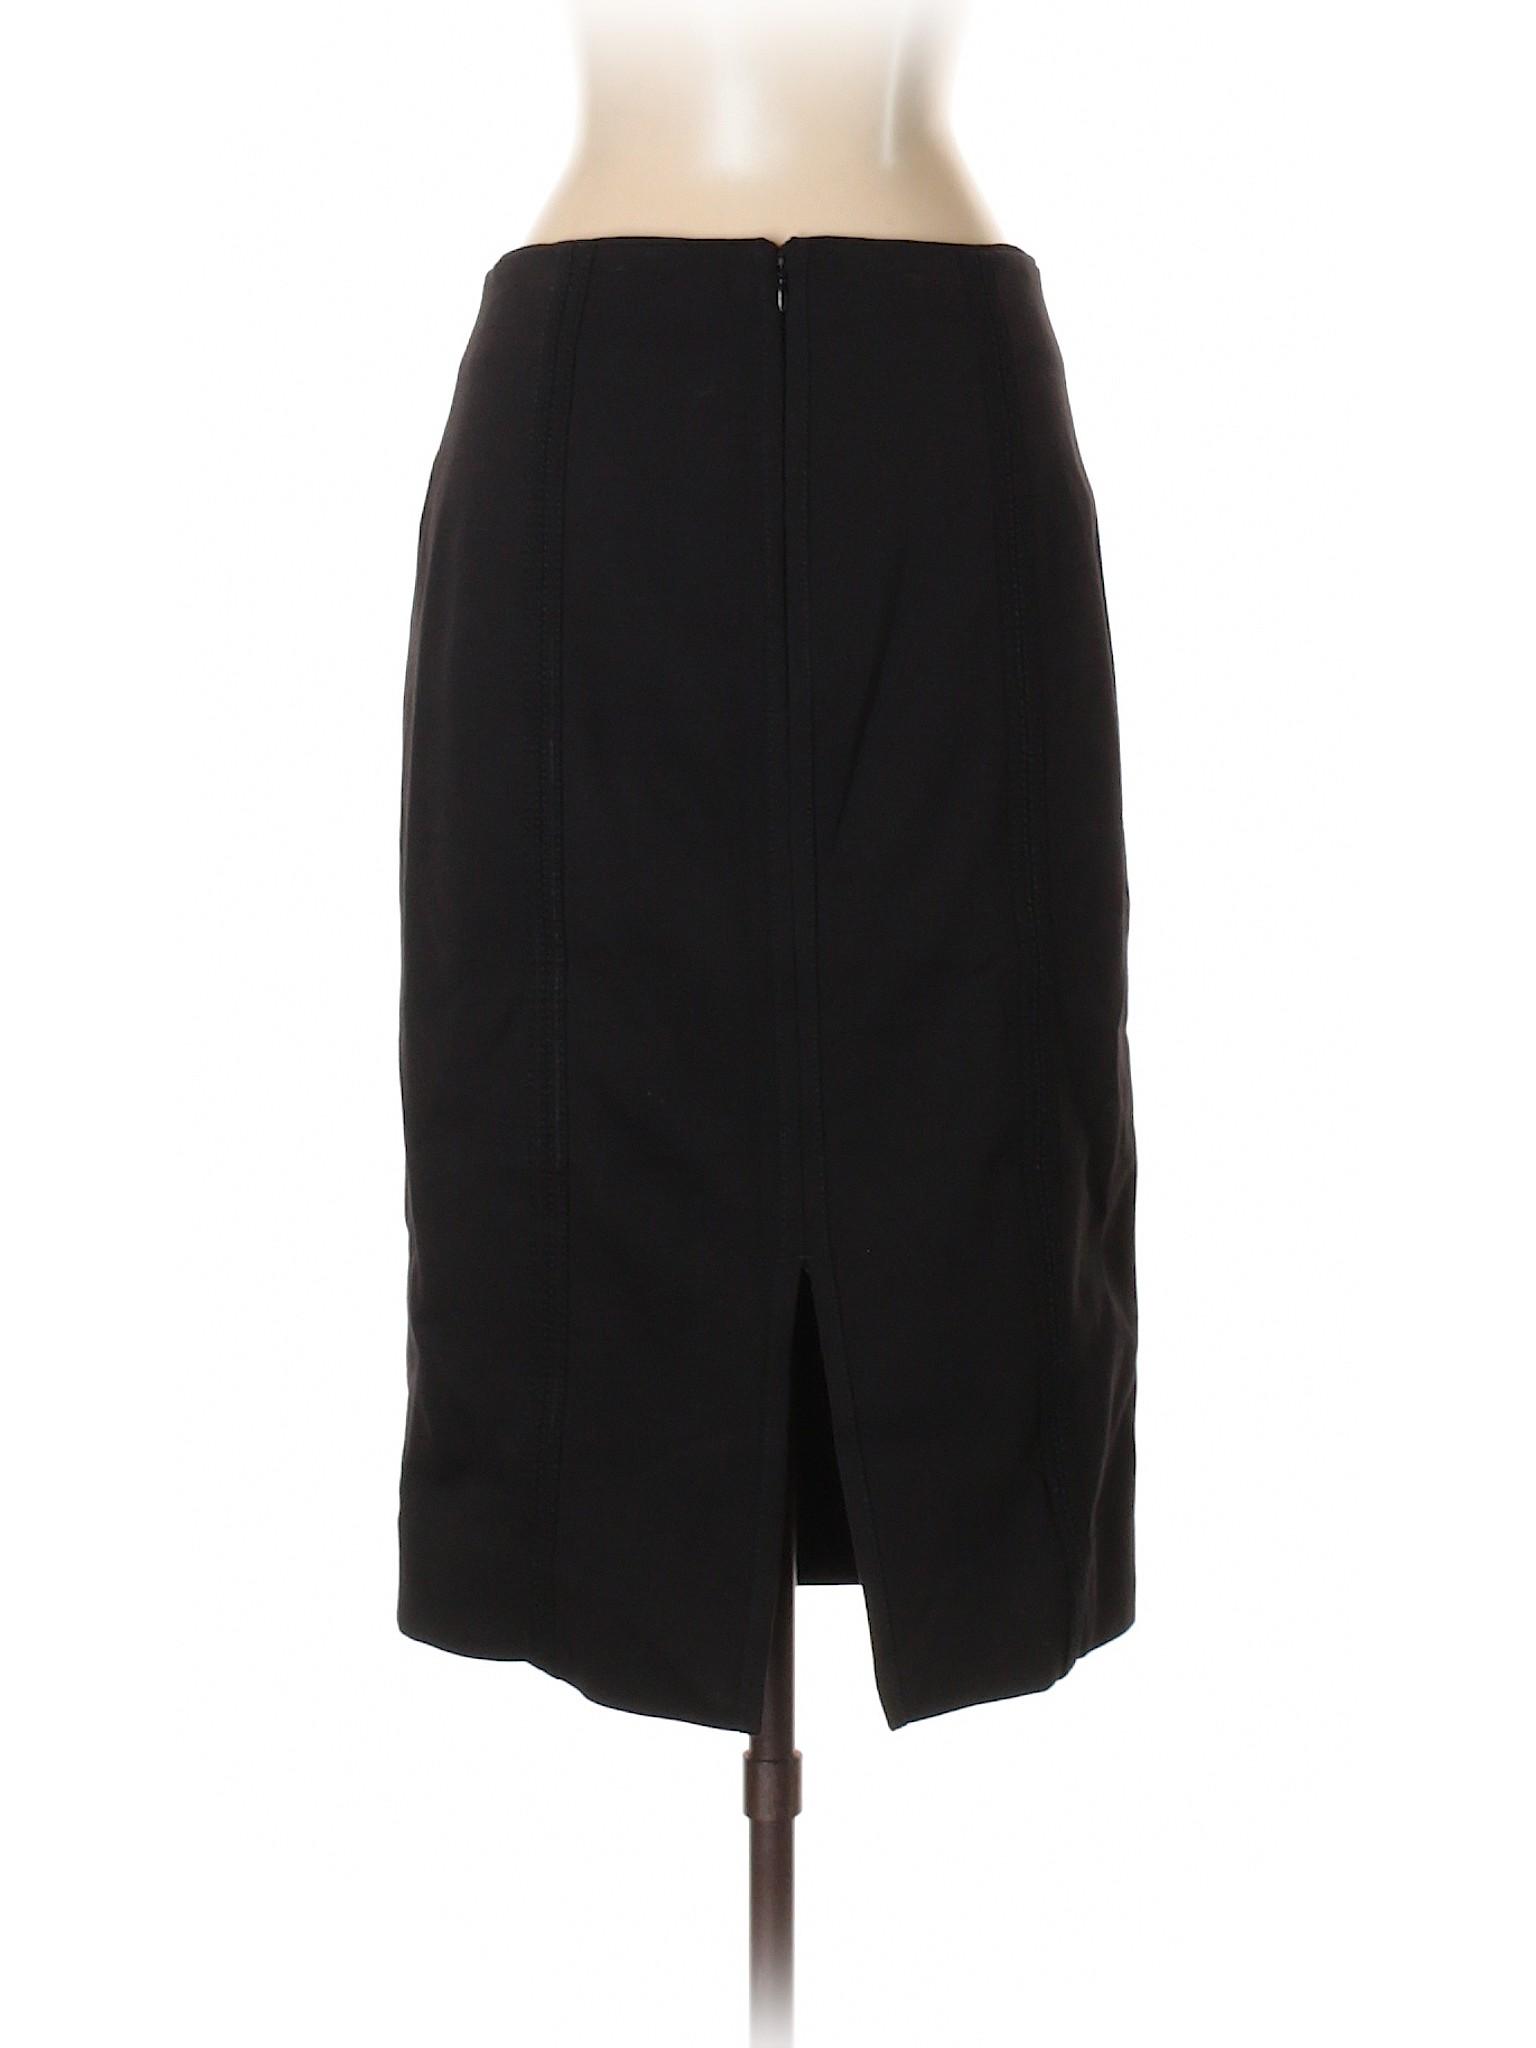 Boutique Skirt Boutique Boutique Casual Boutique Skirt Casual Casual Boutique Skirt Boutique Skirt Skirt Casual Casual fHSfqrwE